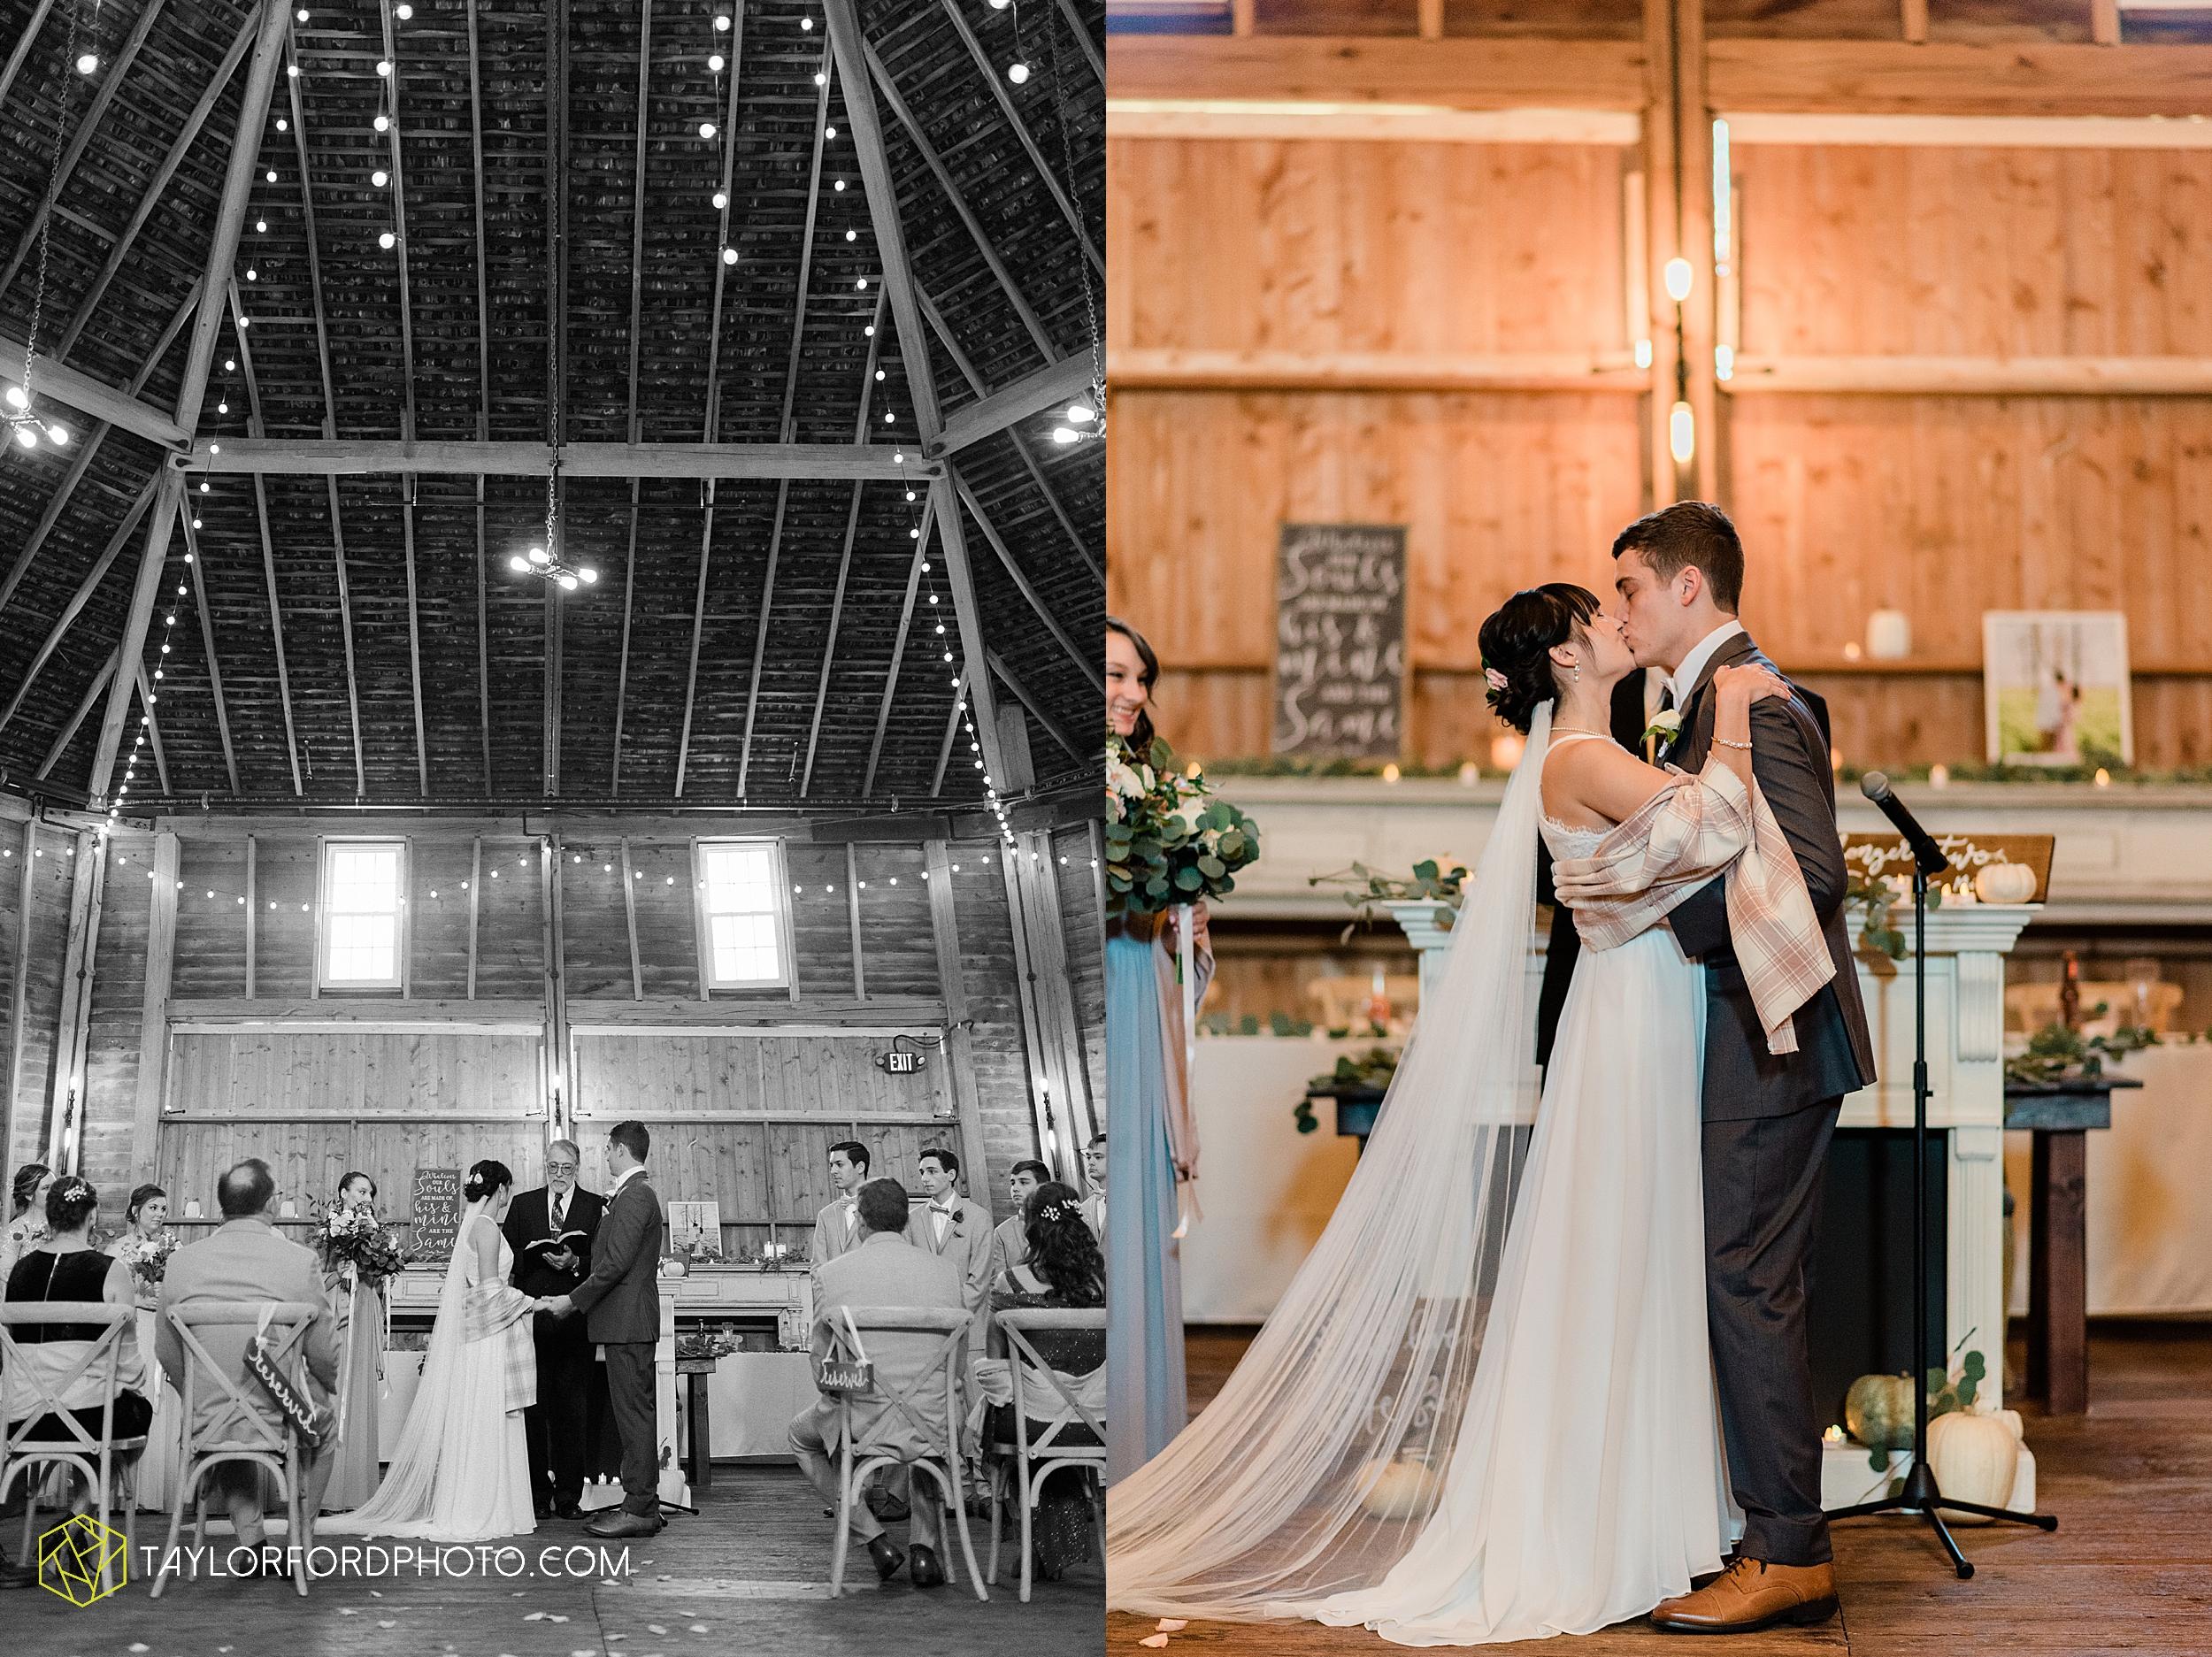 marissa-nicole-nick-daeger-orrmont-estate-farm-wedding-piqua-dayton-troy-ohio-fall-photographer-taylor-ford-photography_1529.jpg